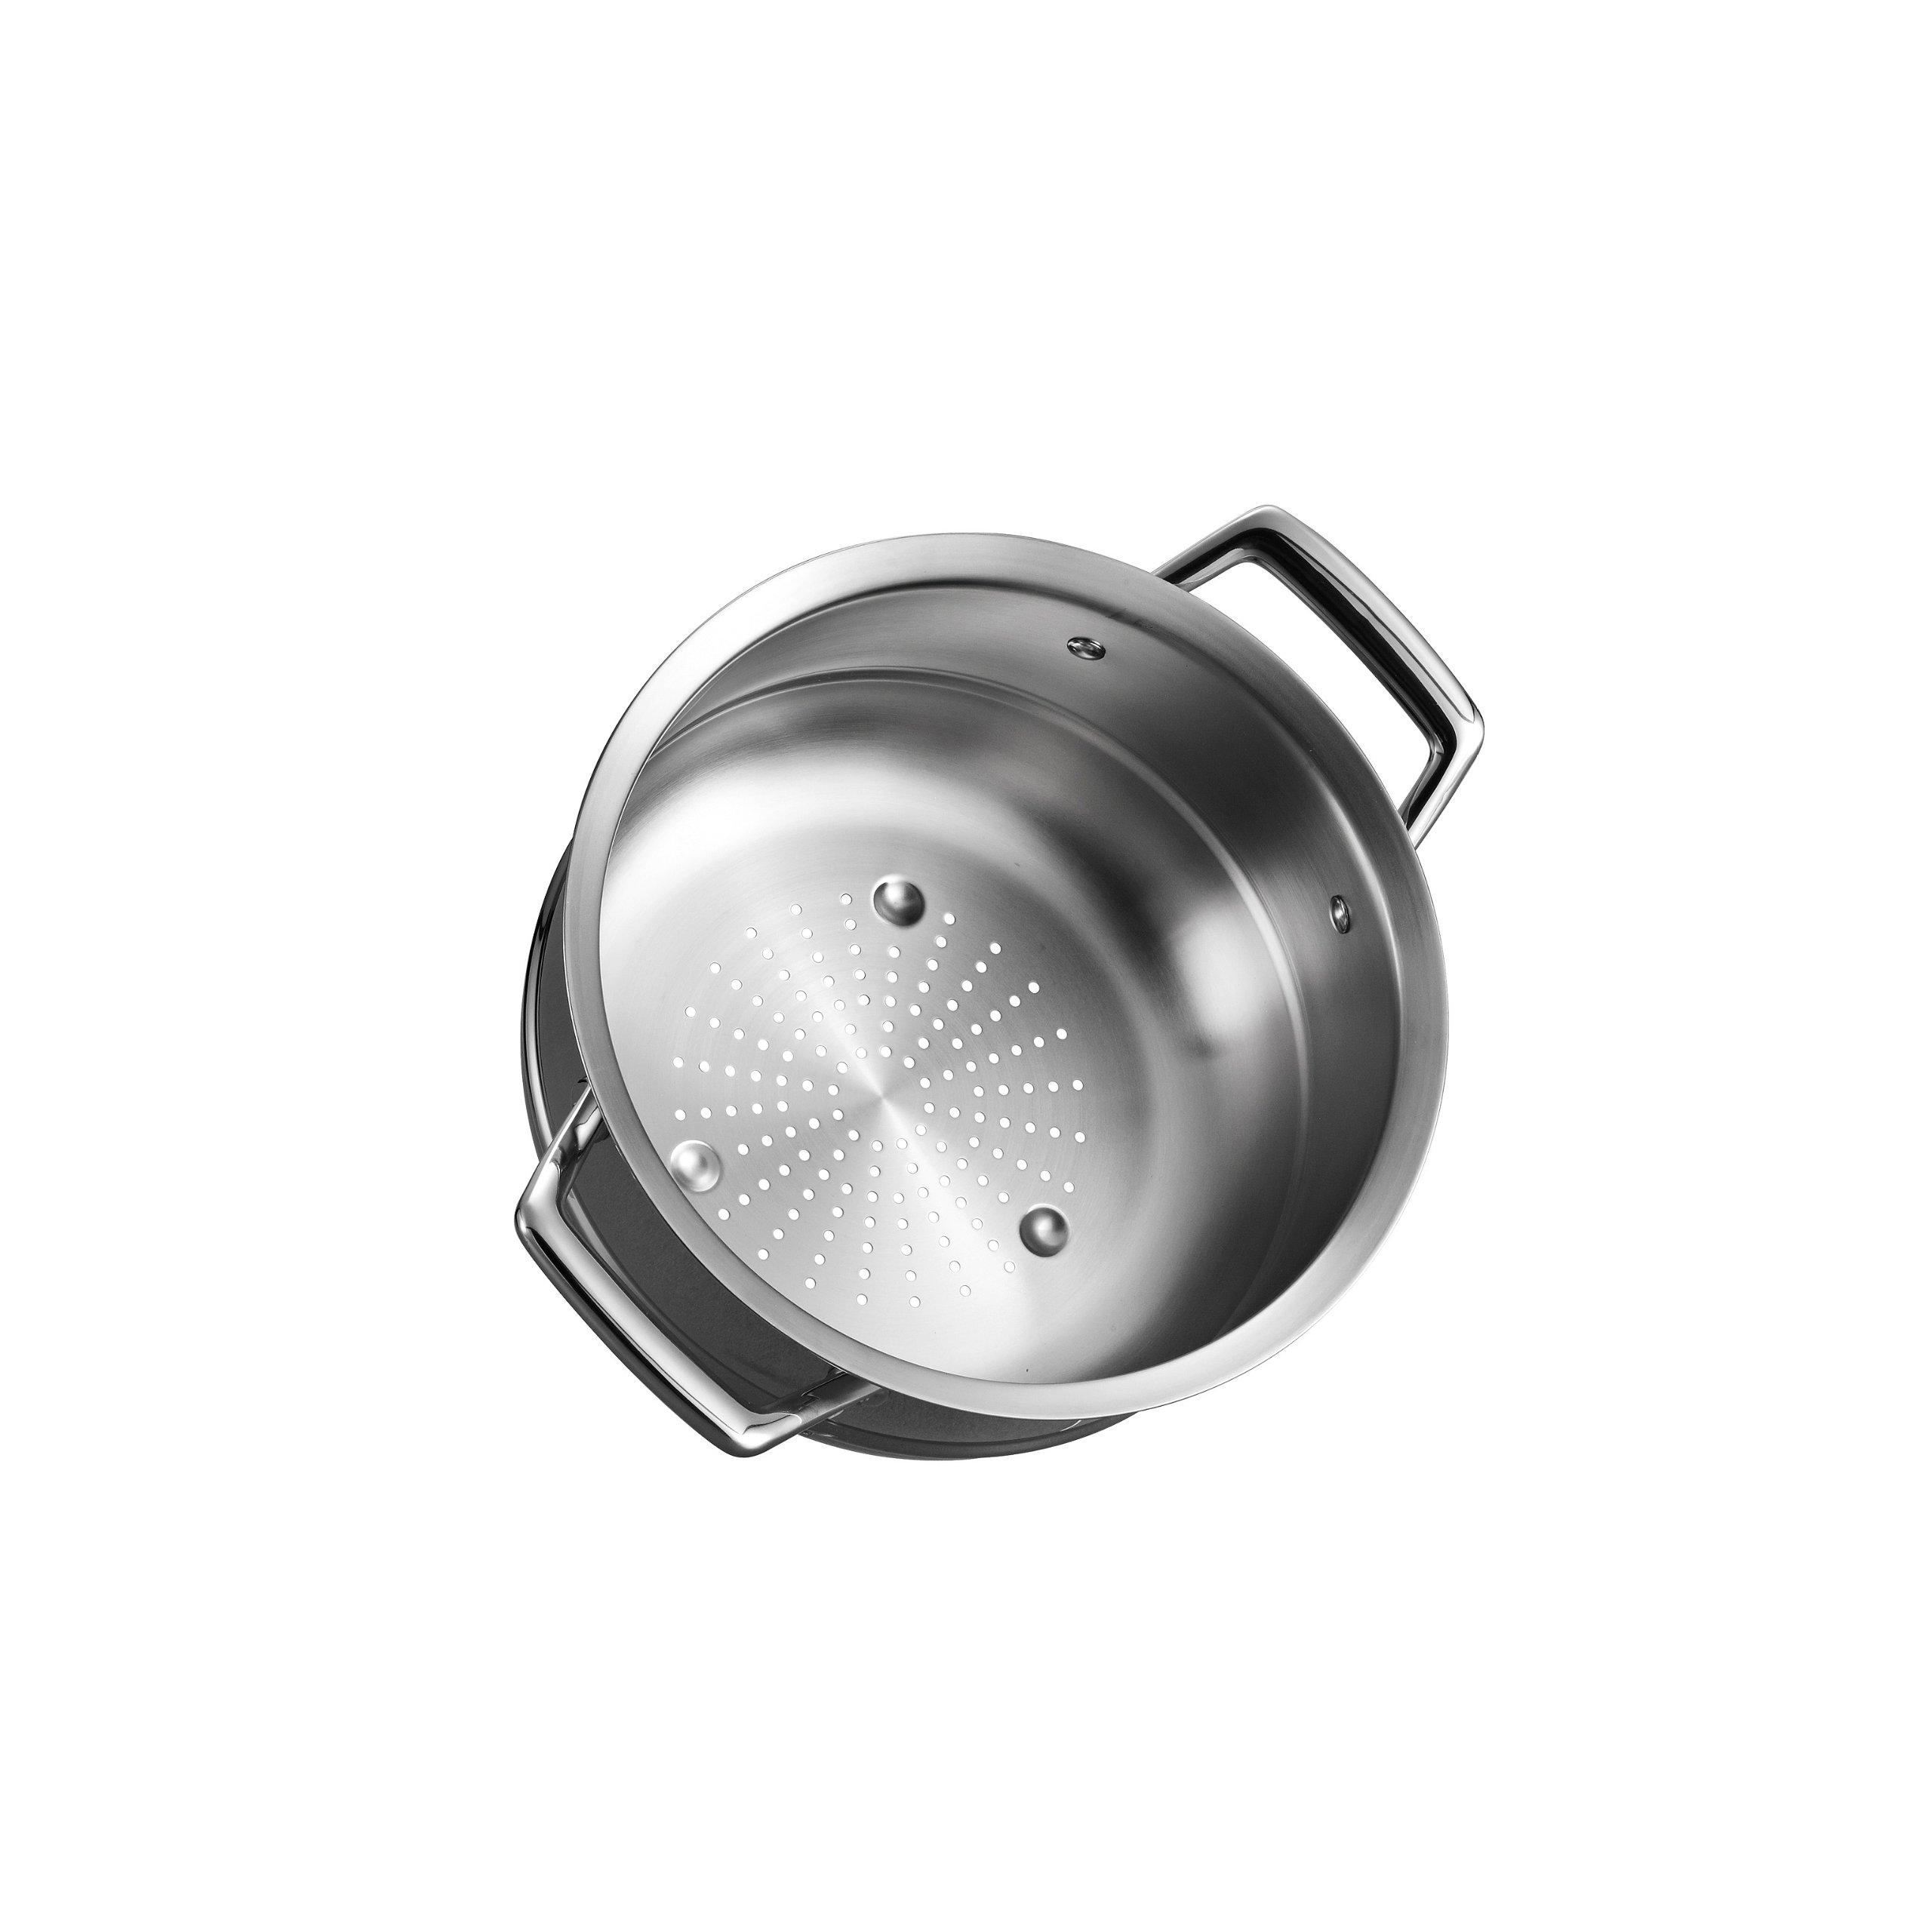 Tramontina 80101/018DS Gourmet Prima Stainless Steel Steamer Insert (24cm - Fits 5 qt Dutch Oven, 6 Qt Sauce Pot & 8 Qt Stock Pot), 10 inch, Made in Brazil